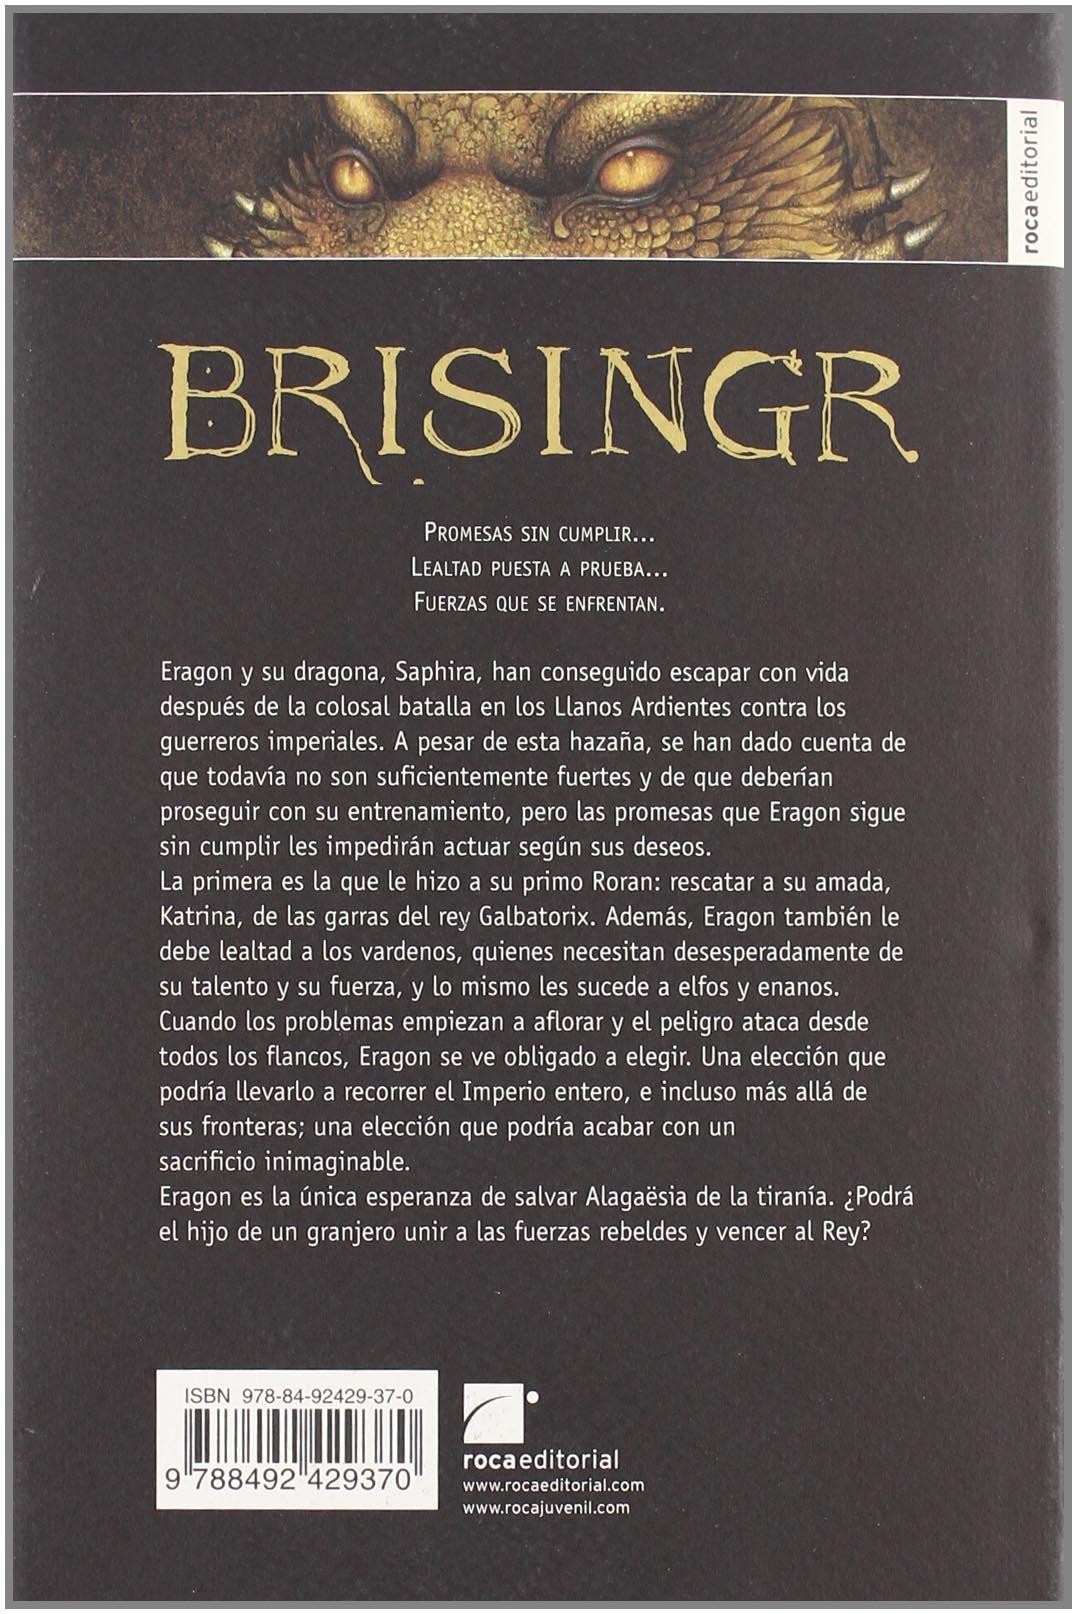 Brisingr (Spanish Edition) by Roca Editorial (Image #1)